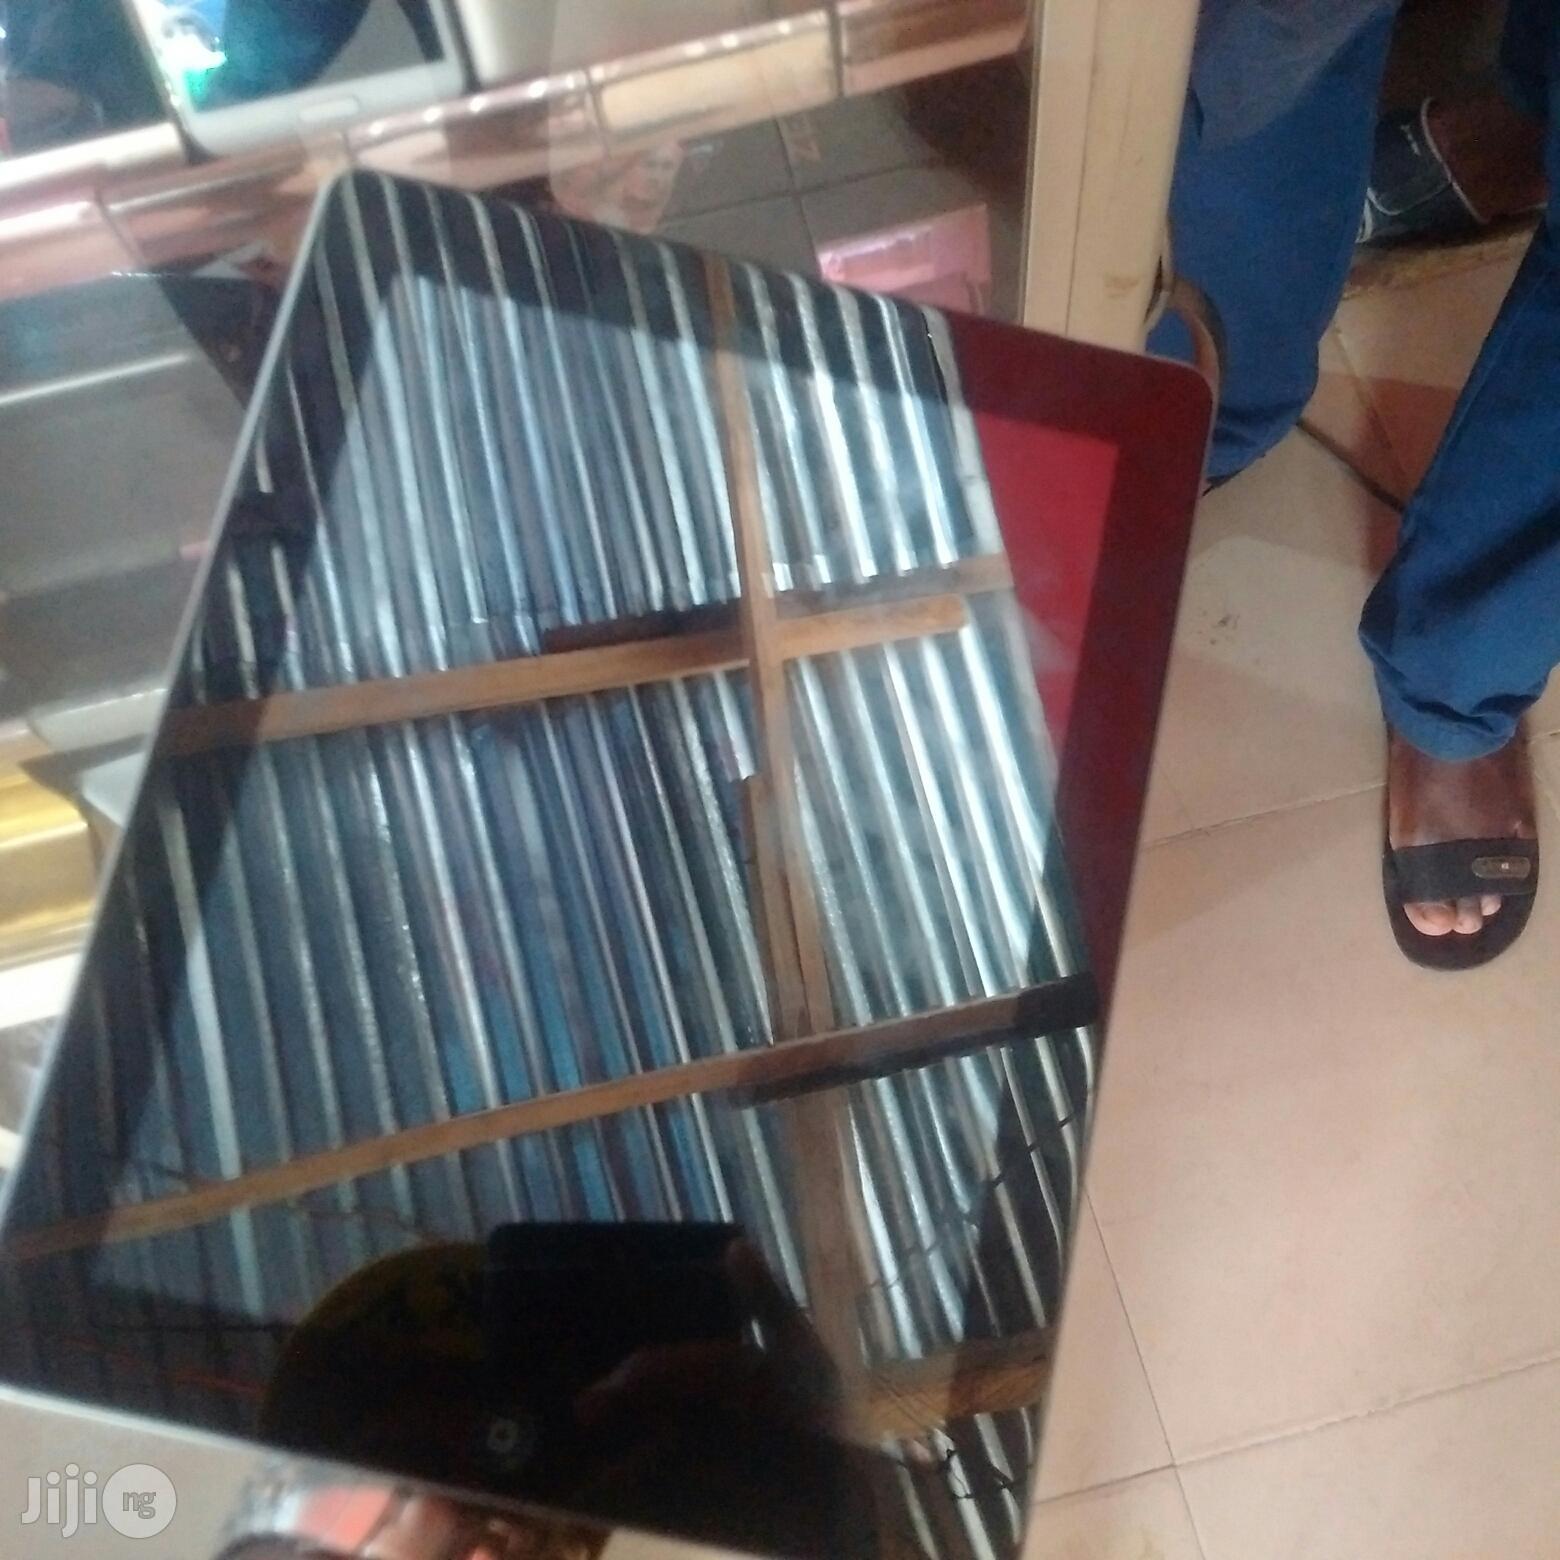 Apple iPad 4 Wi-Fi Cellular 16 GB   Tablets for sale in Ikeja, Lagos State, Nigeria